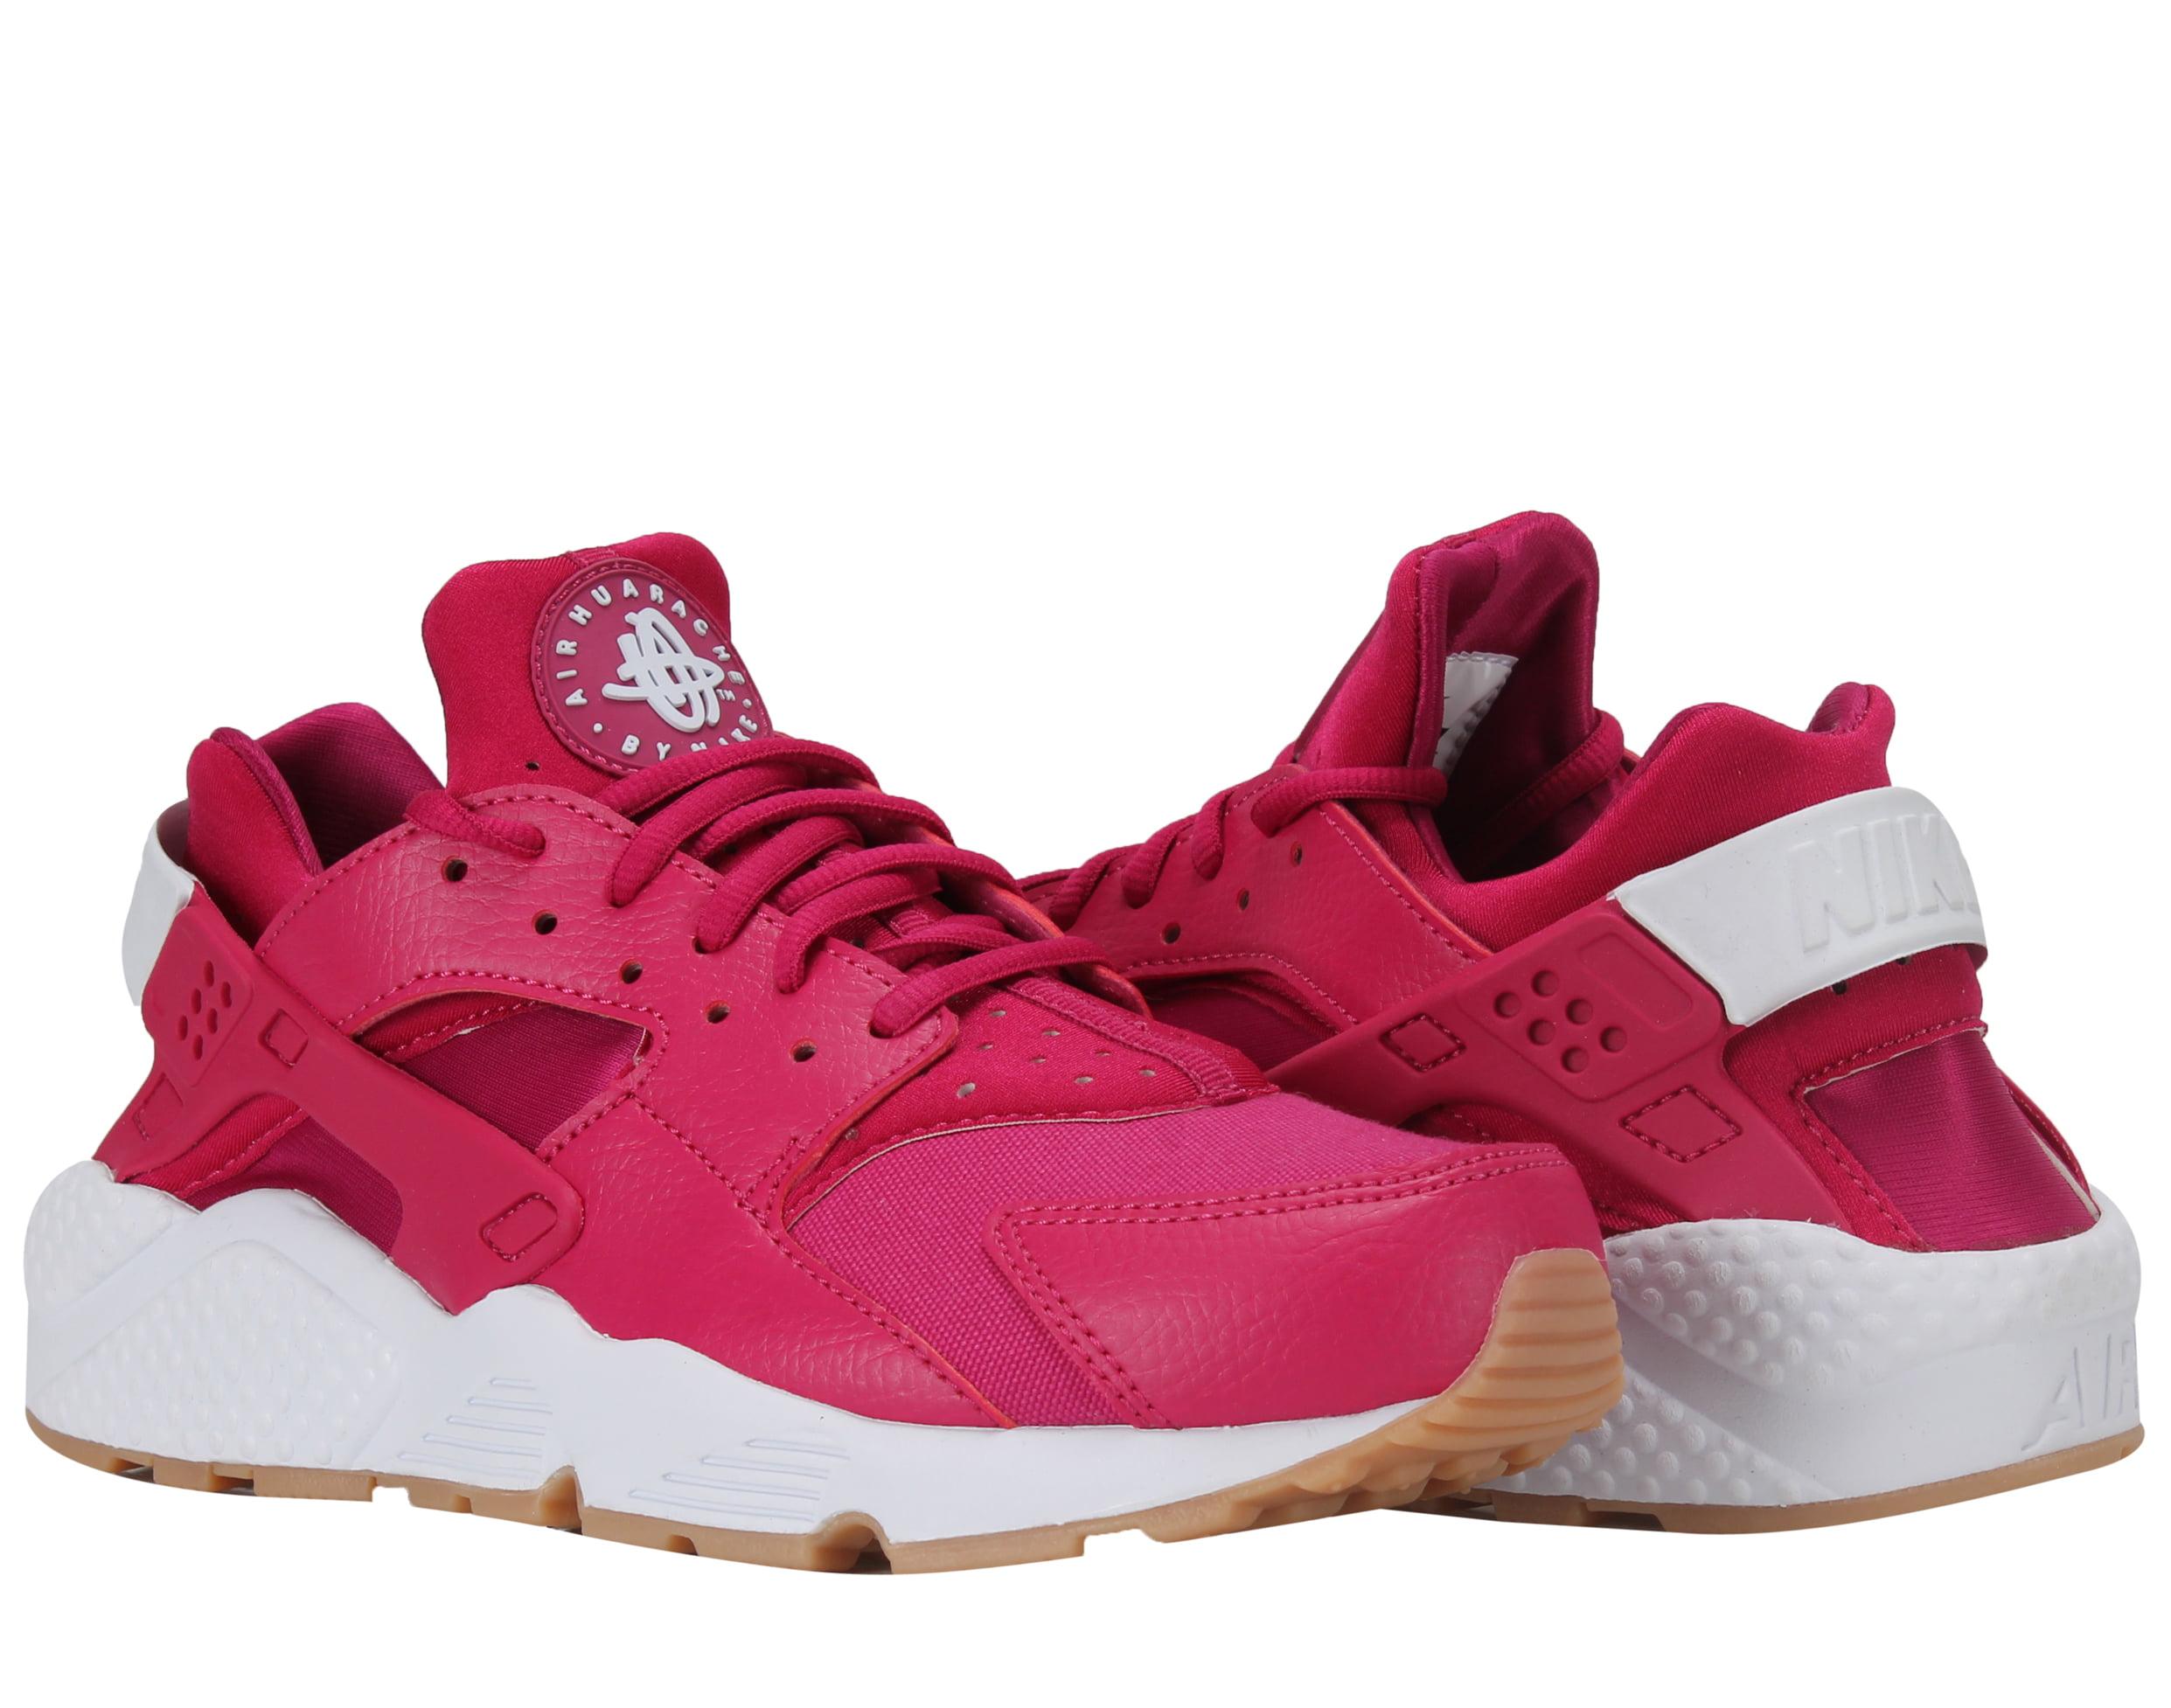 online retailer 998cb dadd2 Nike Air Huarache Run Fuchisia White-Gum Women s Running Shoes 634835-606  by Nike